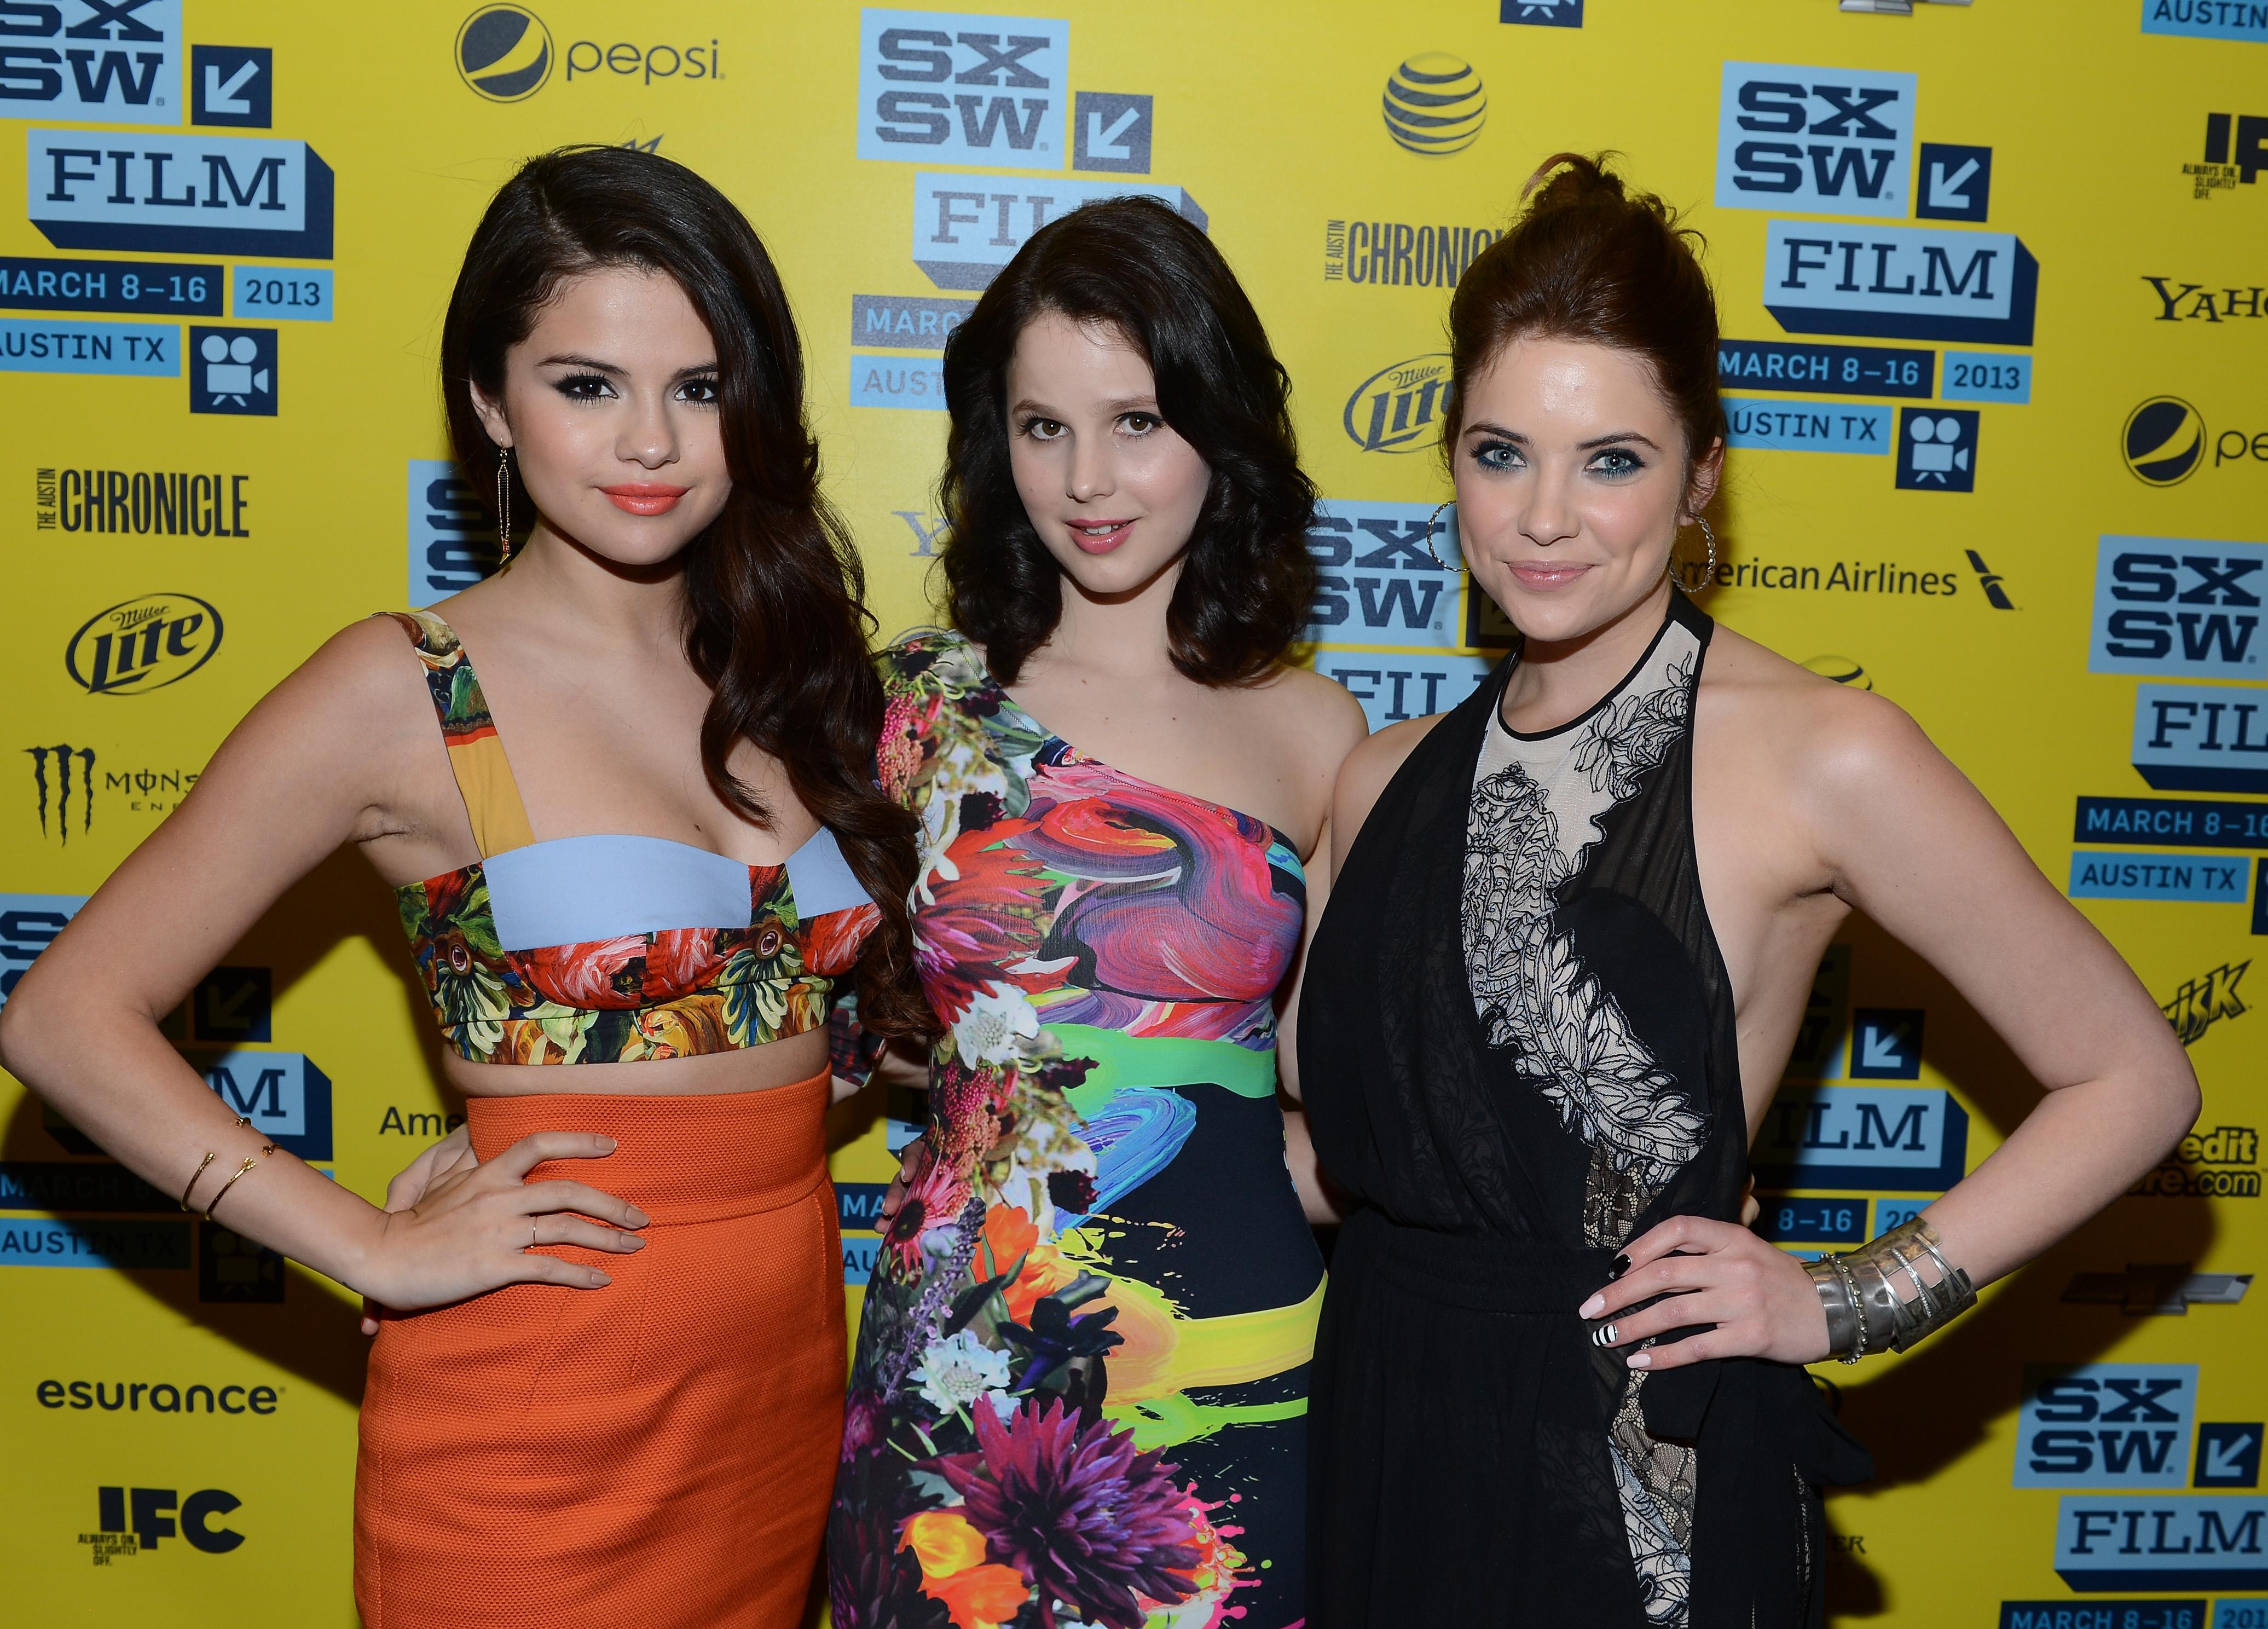 Selena Gomez, Rachel Korine, and Ashley Benson linked up at SXSW.